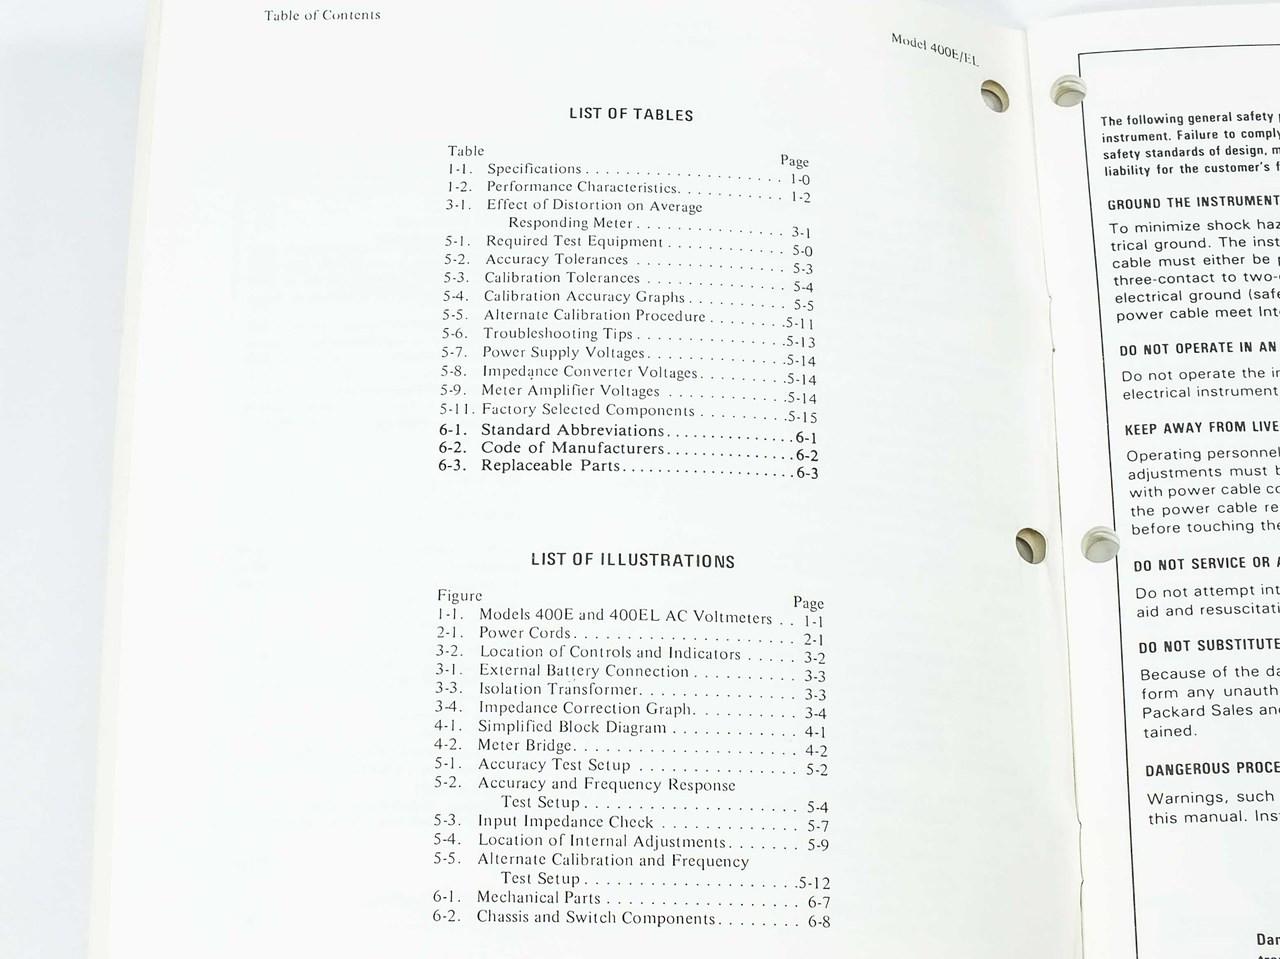 HP 400E/400EL AC Voltmeter Operating and Service Manual